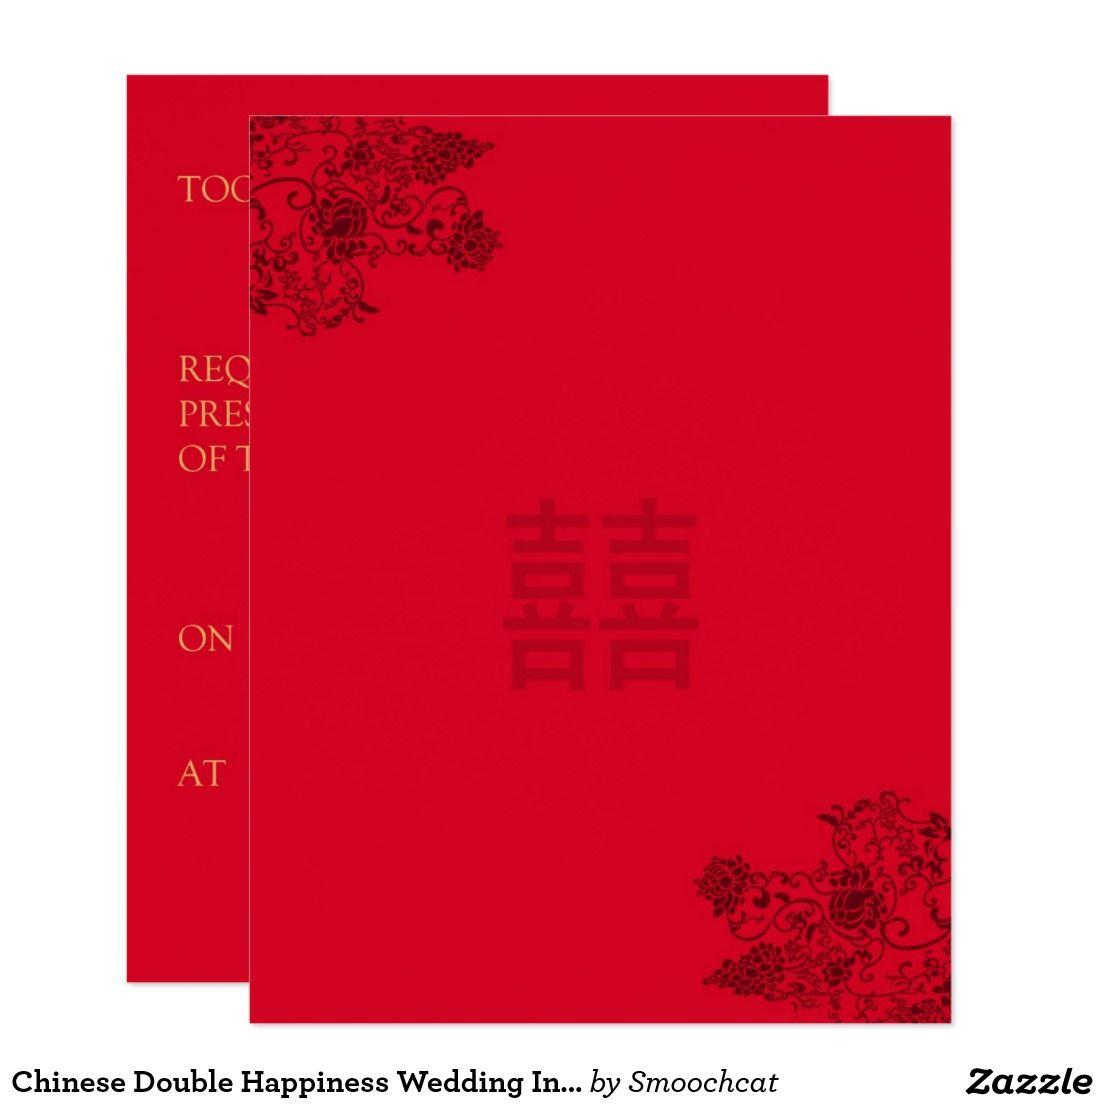 Chinese Double Happiness Wedding Invitation   Chinese wedding ...